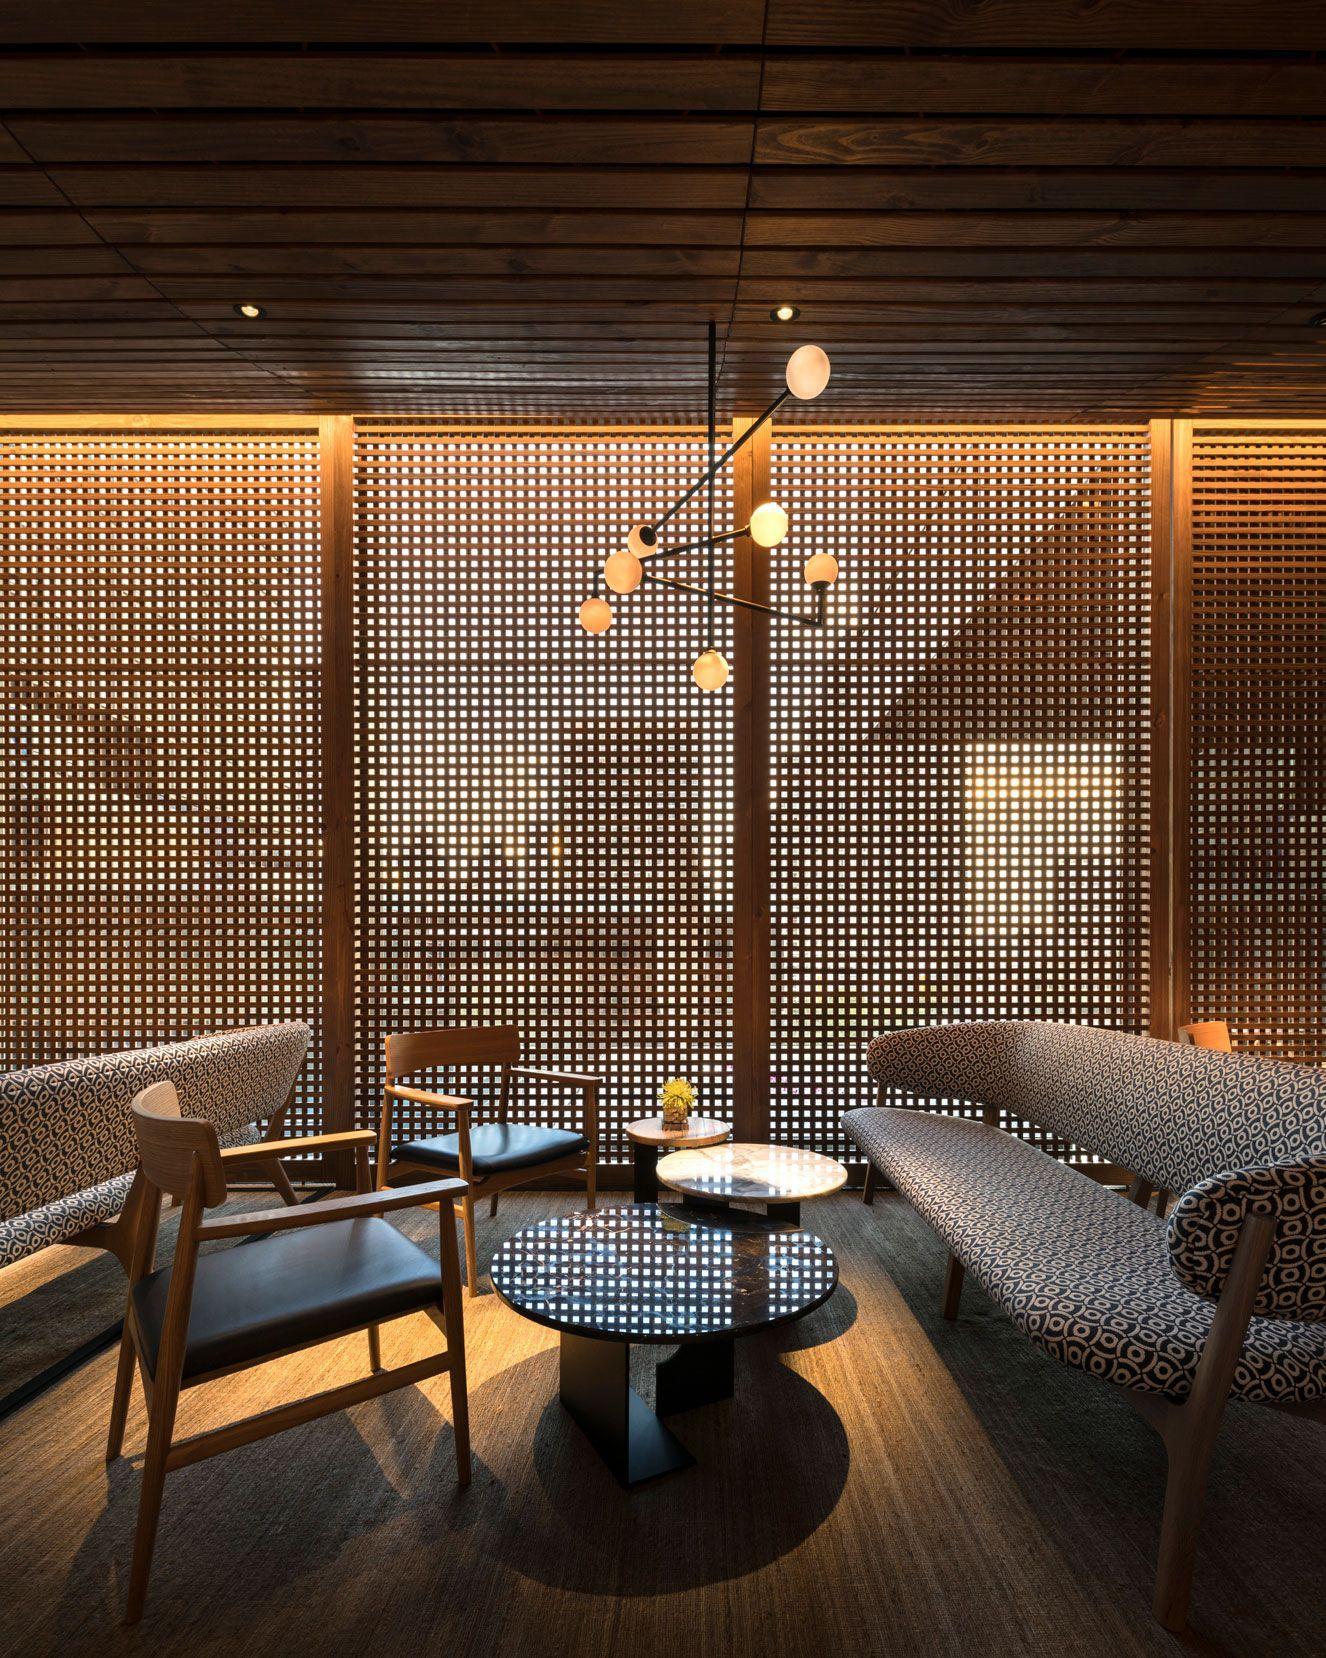 Morimoto Restaurant. Interior Design » mpdStudio | concept ...